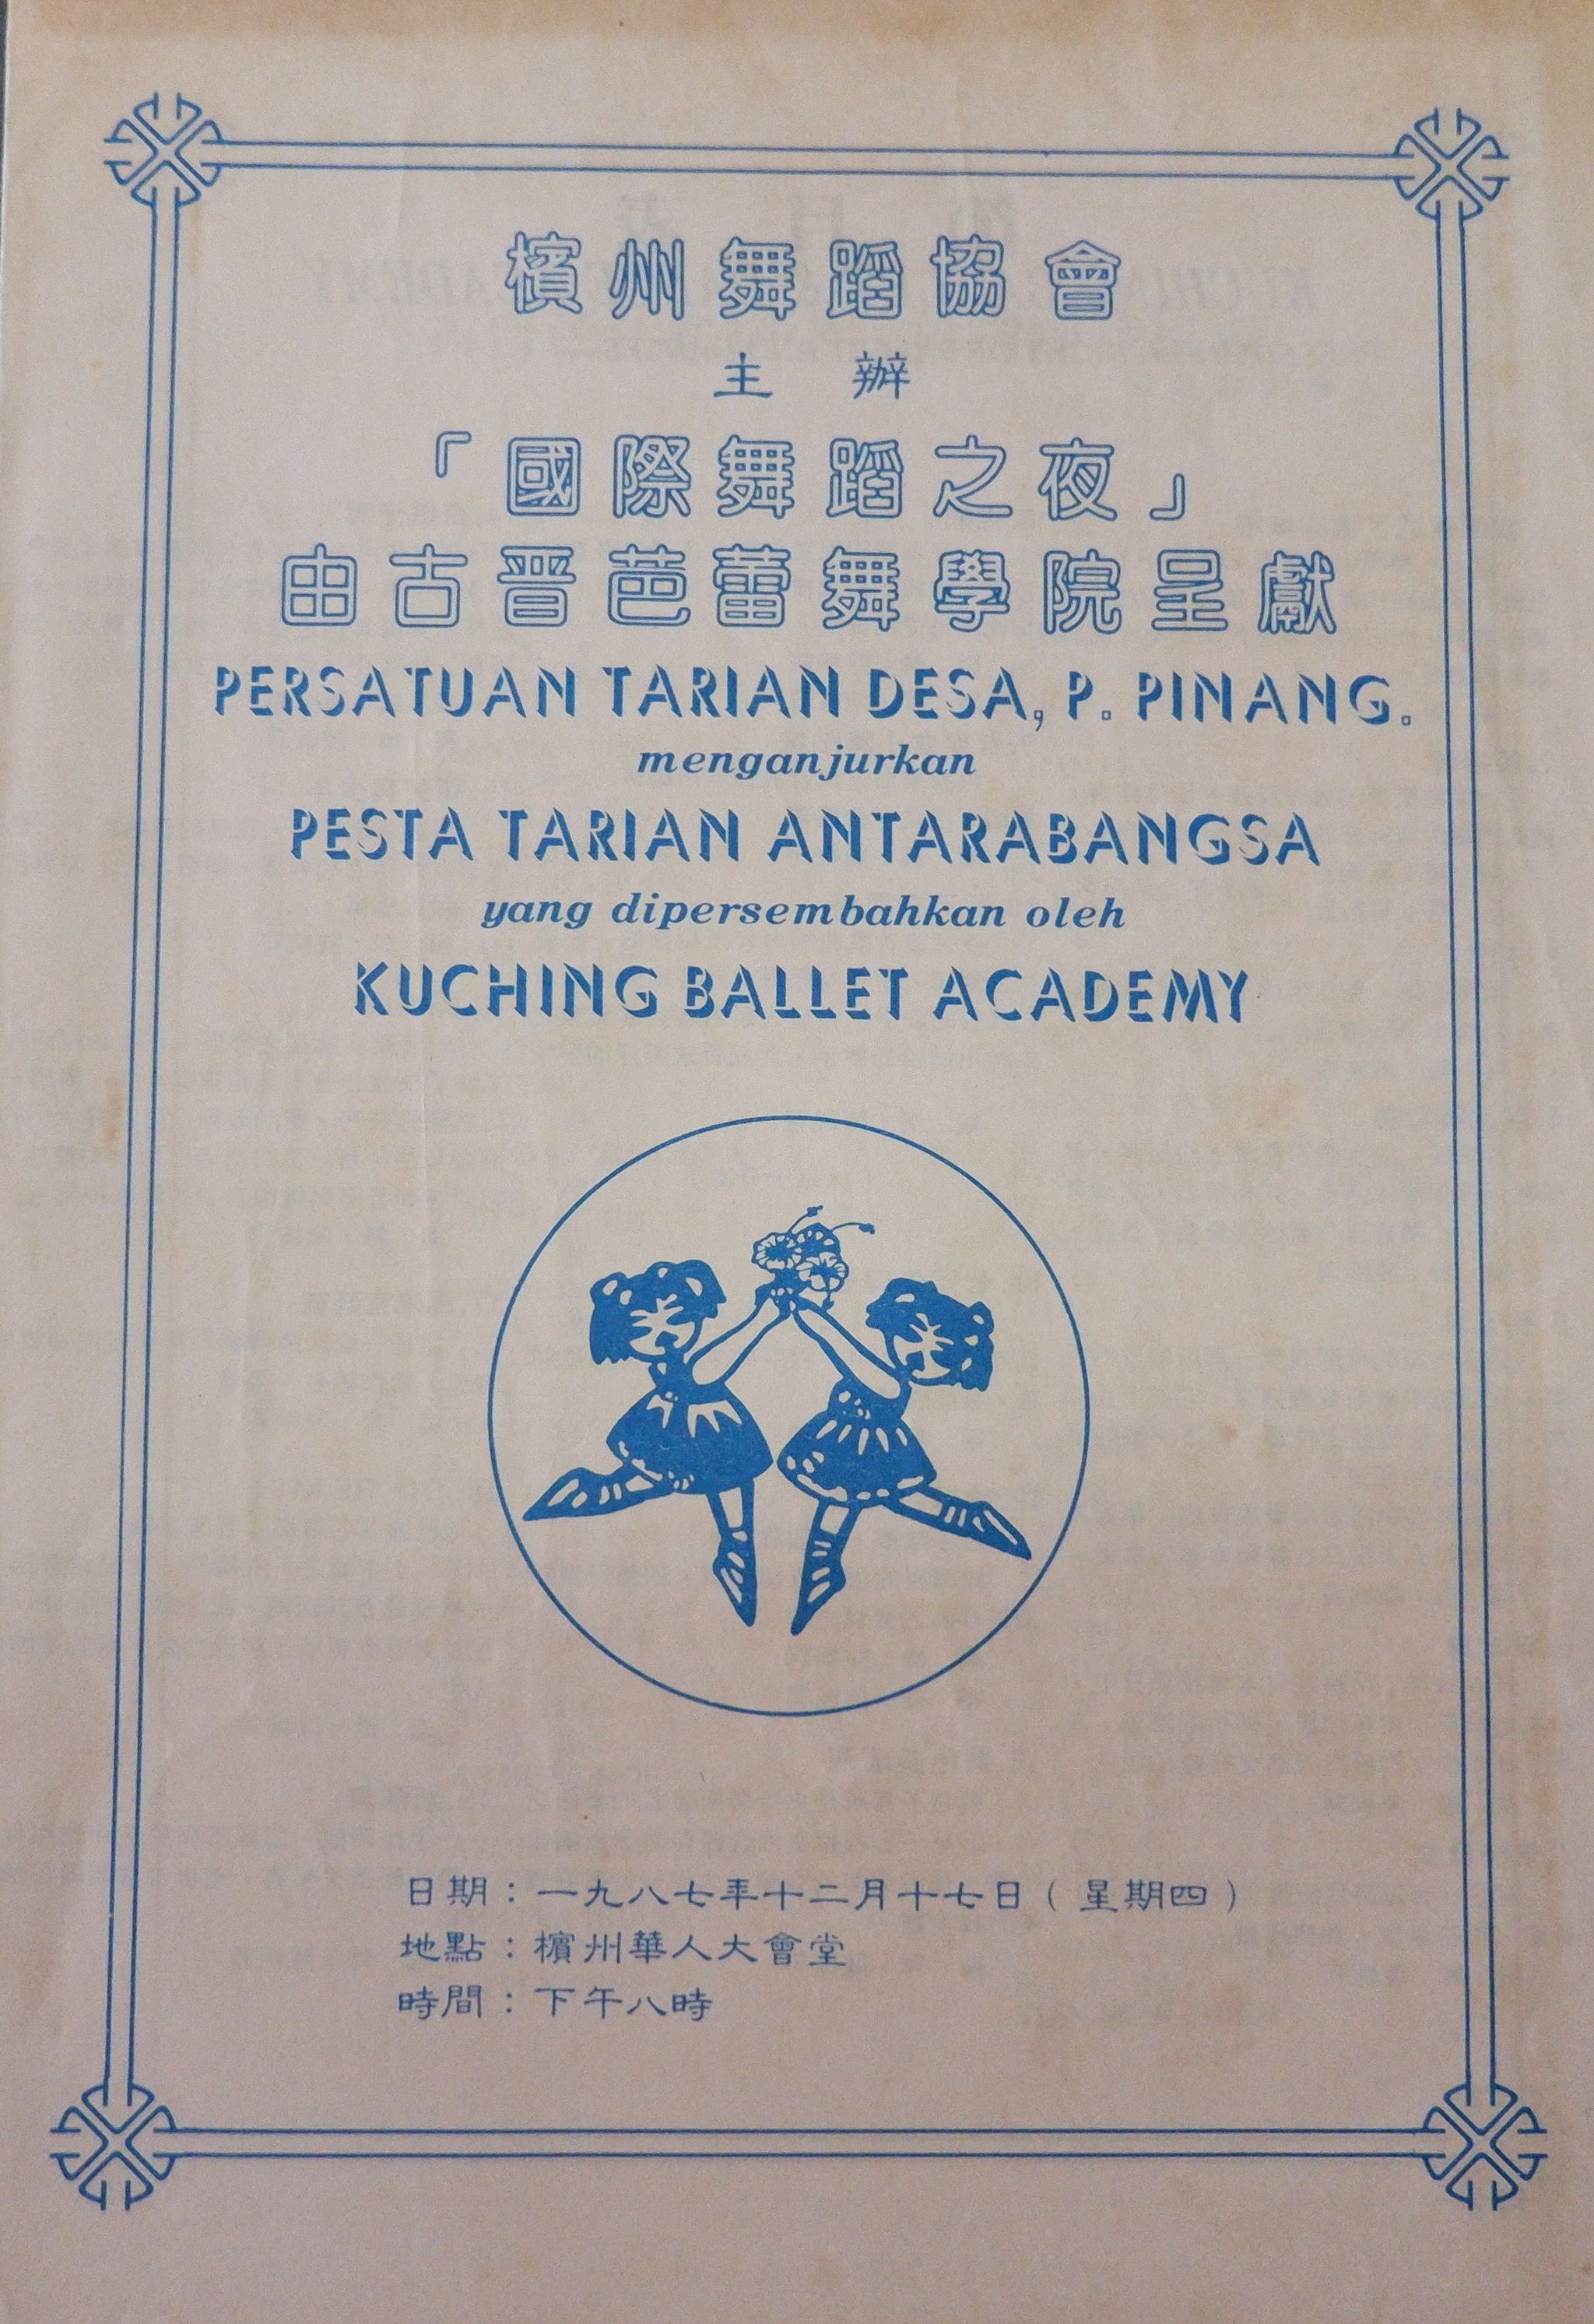 1987 Pesta Tarian Antarabangsa Cover